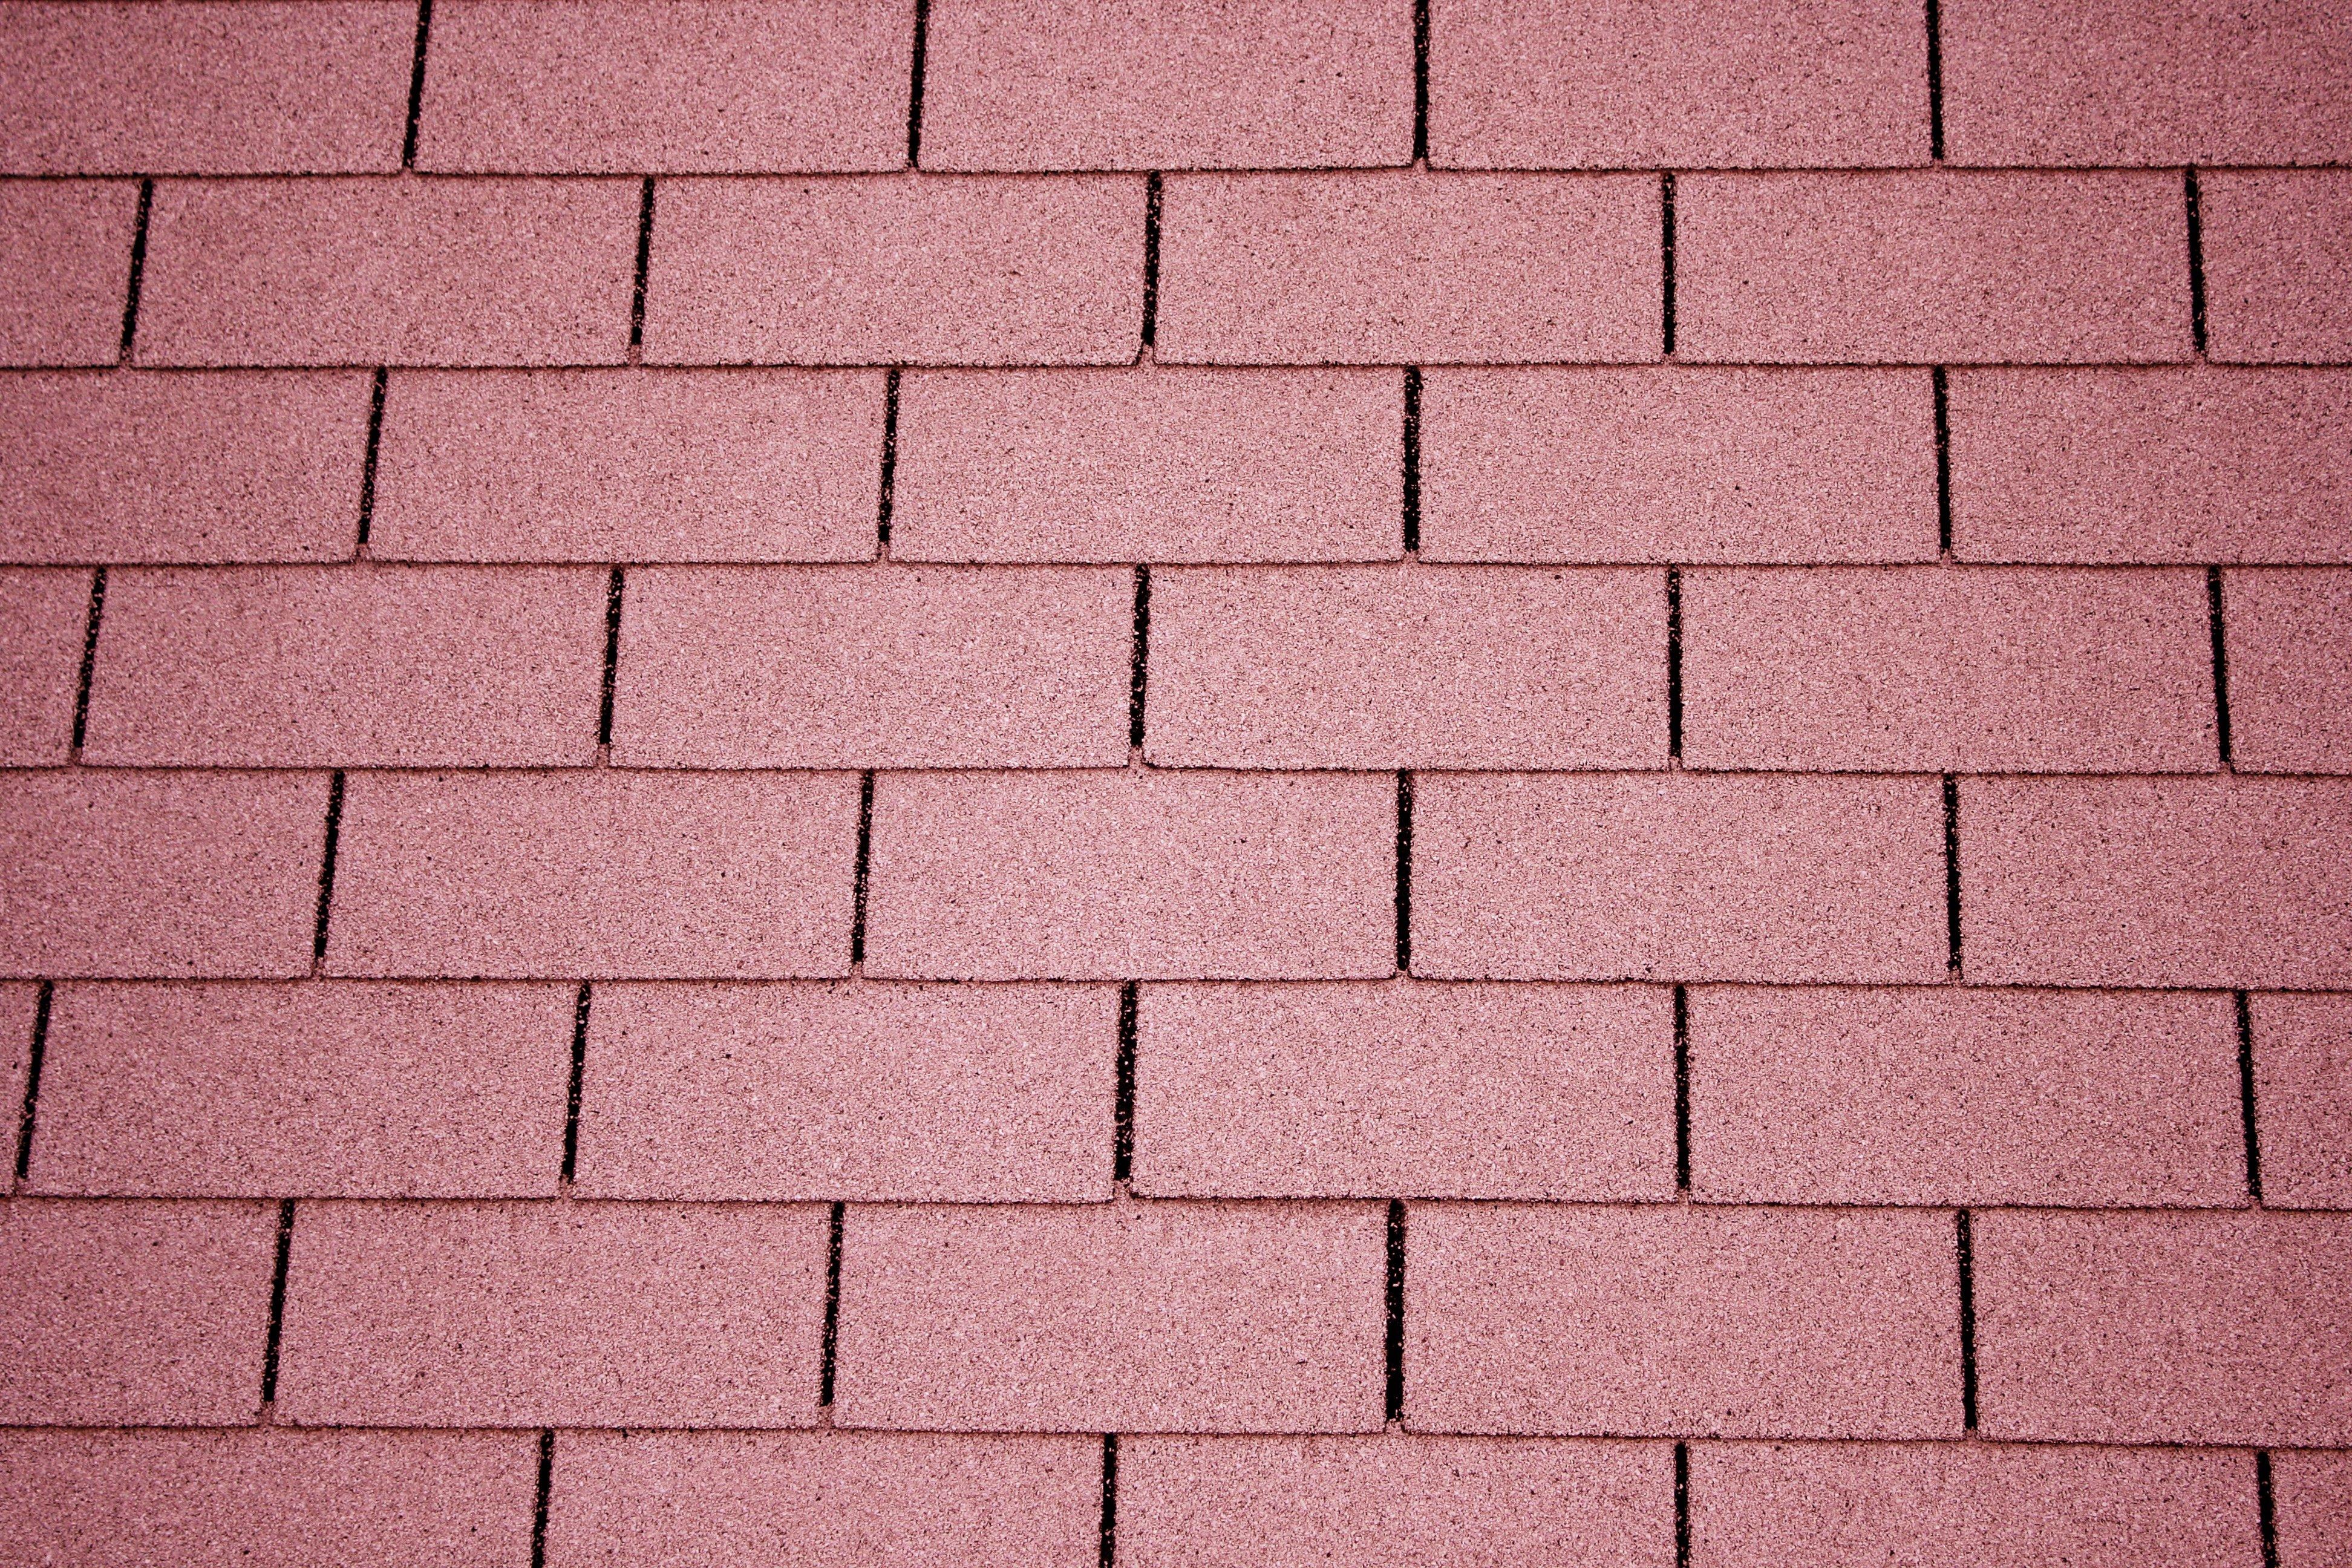 Light Red Asphalt Roof Shingles Texture